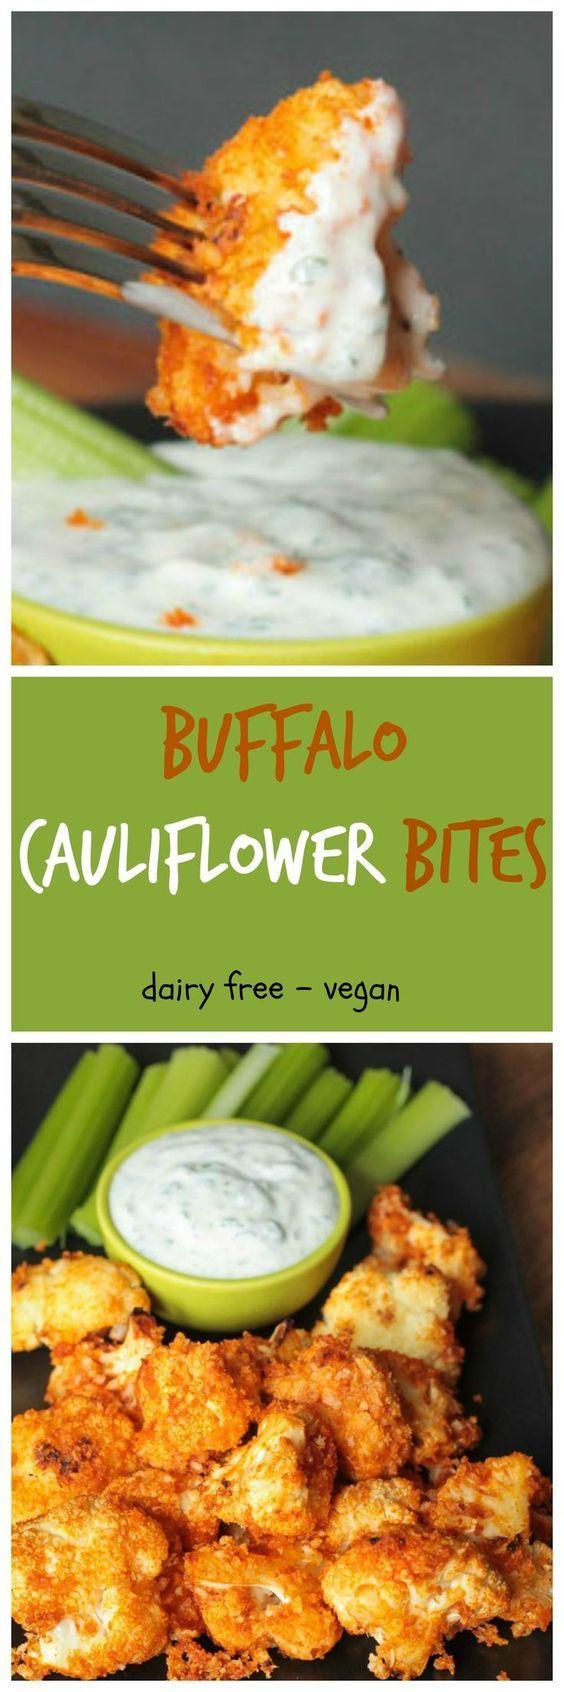 Buffalo Cauliflower Bites and Cheater Vegan Ranch Dip